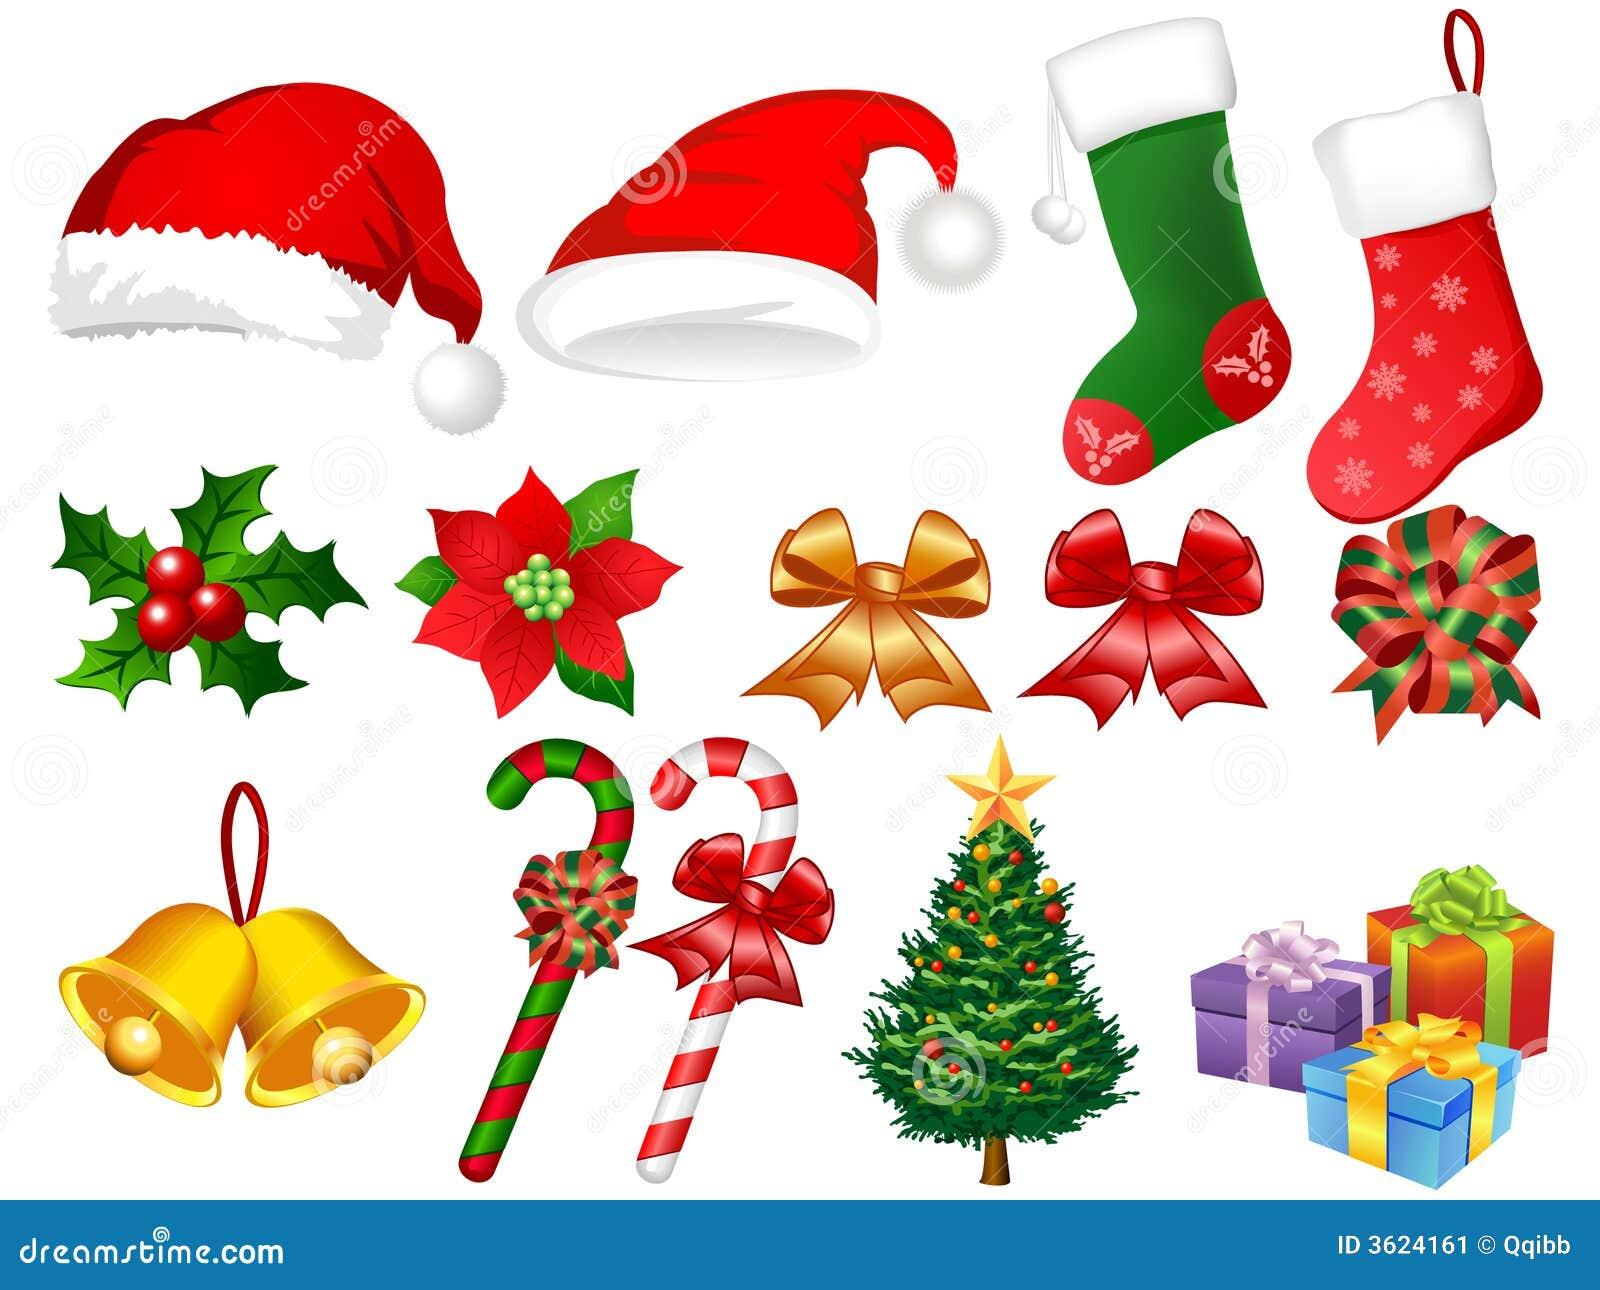 Illustration Of Xmas Ornaments Stock Vector Illustration